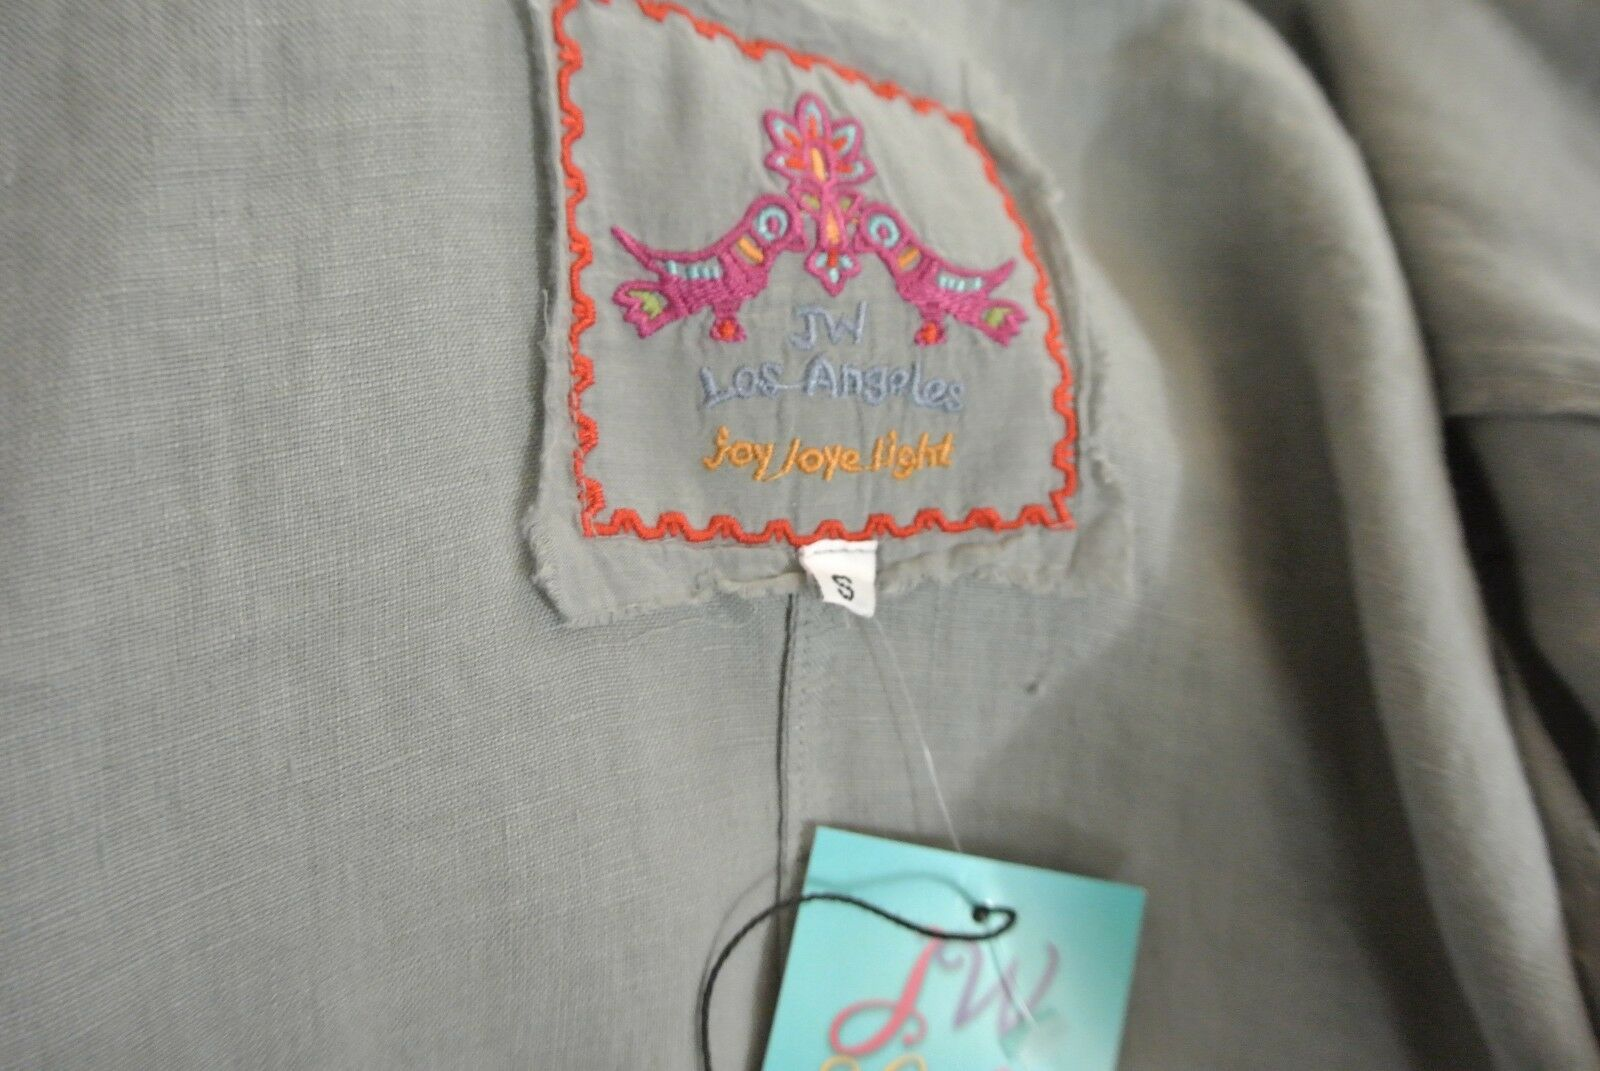 Johnny Was 100% Linen Cardigan Top S grau/Multi-Farbe EmbroideROT EmbroideROT EmbroideROT Boho Chic NWT d3b042